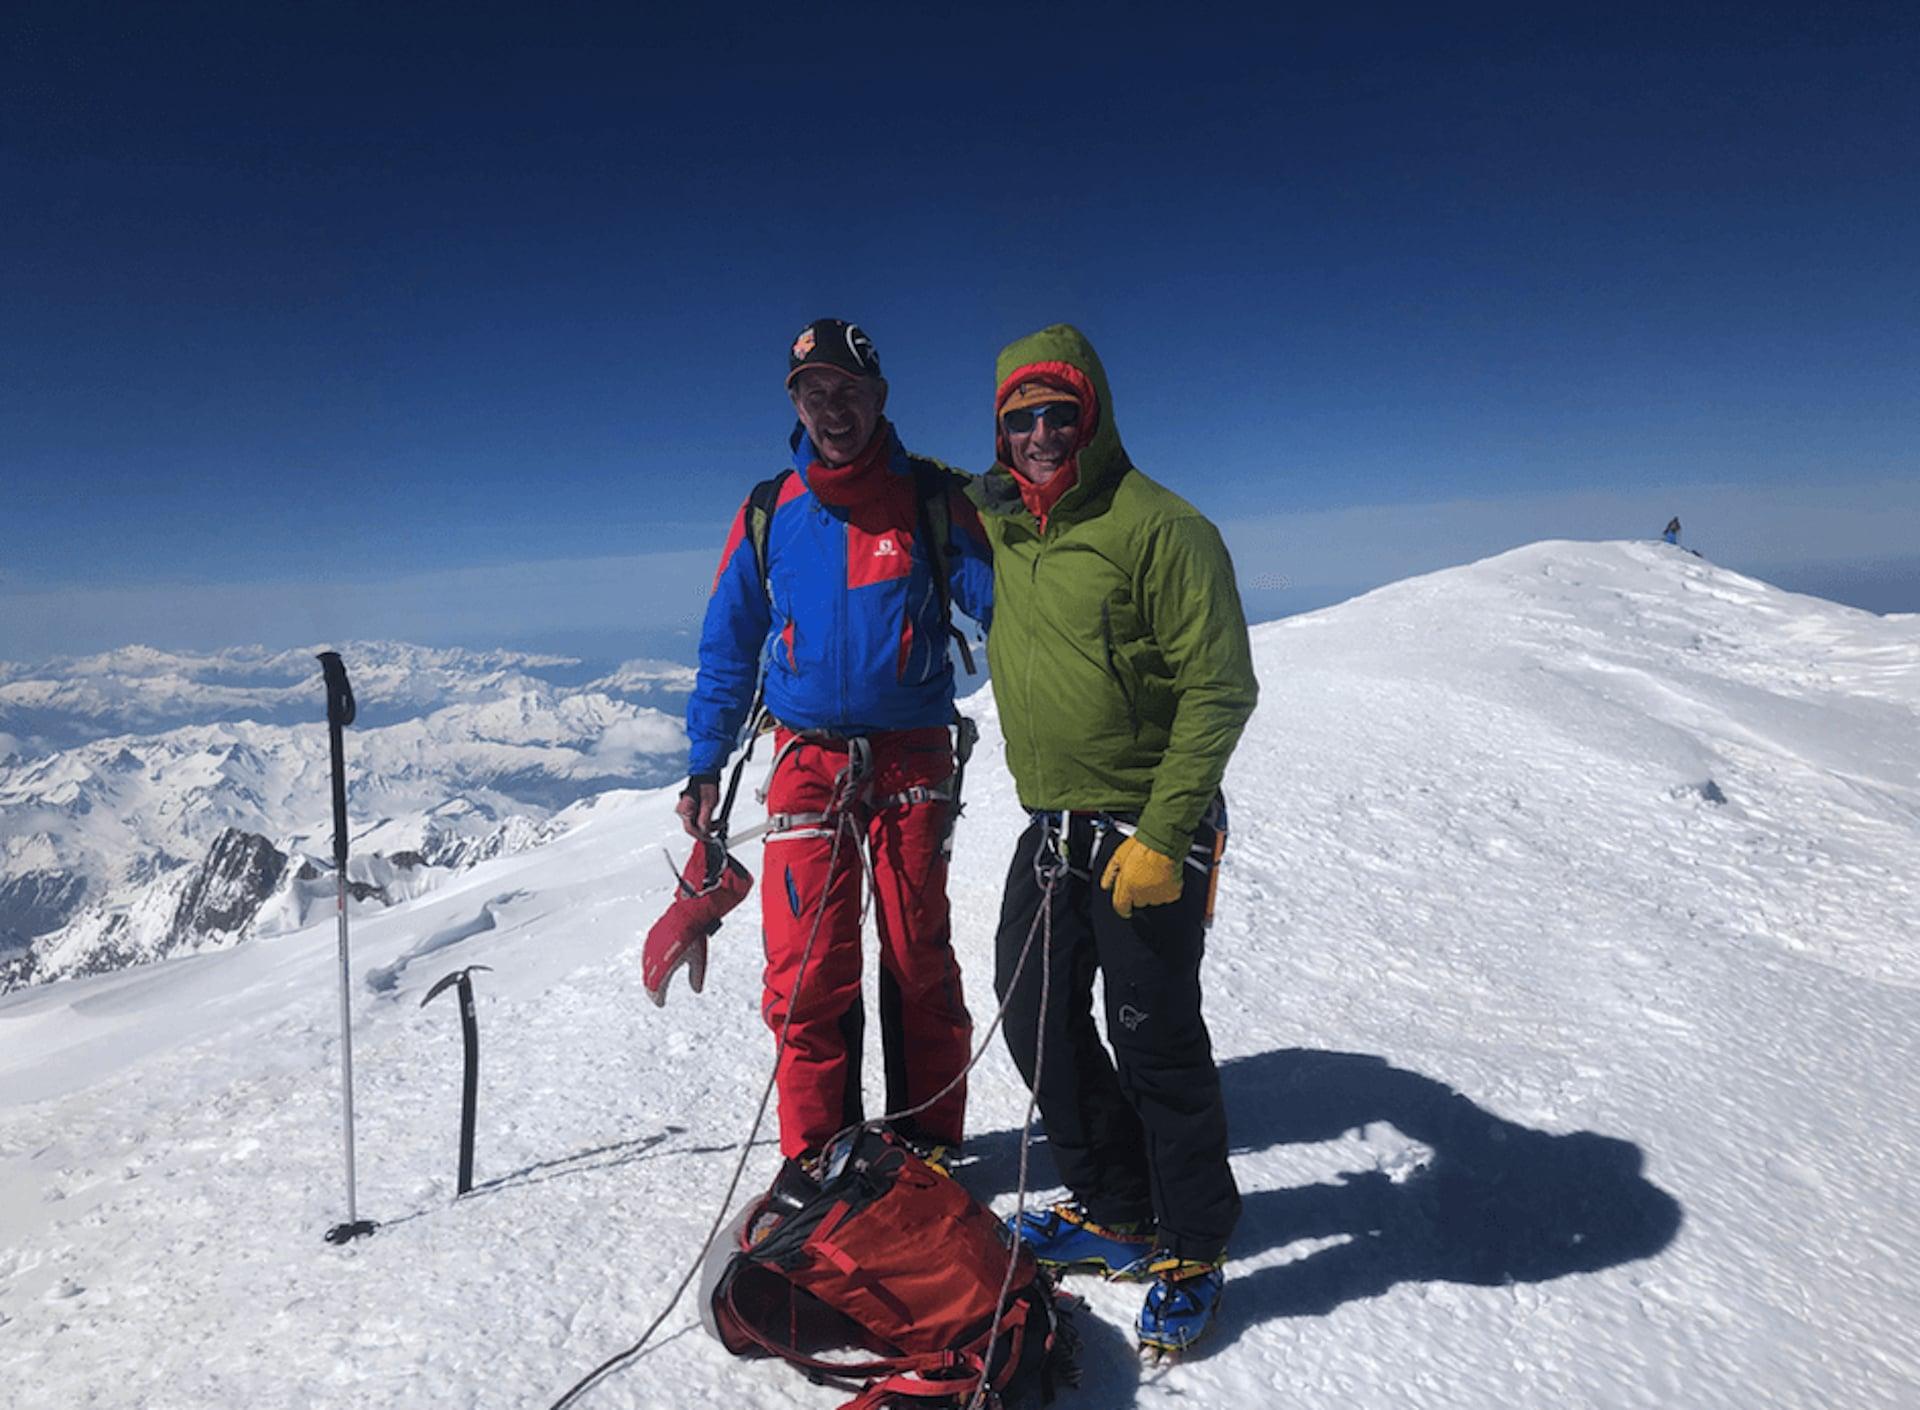 Climbers summit mont blanc